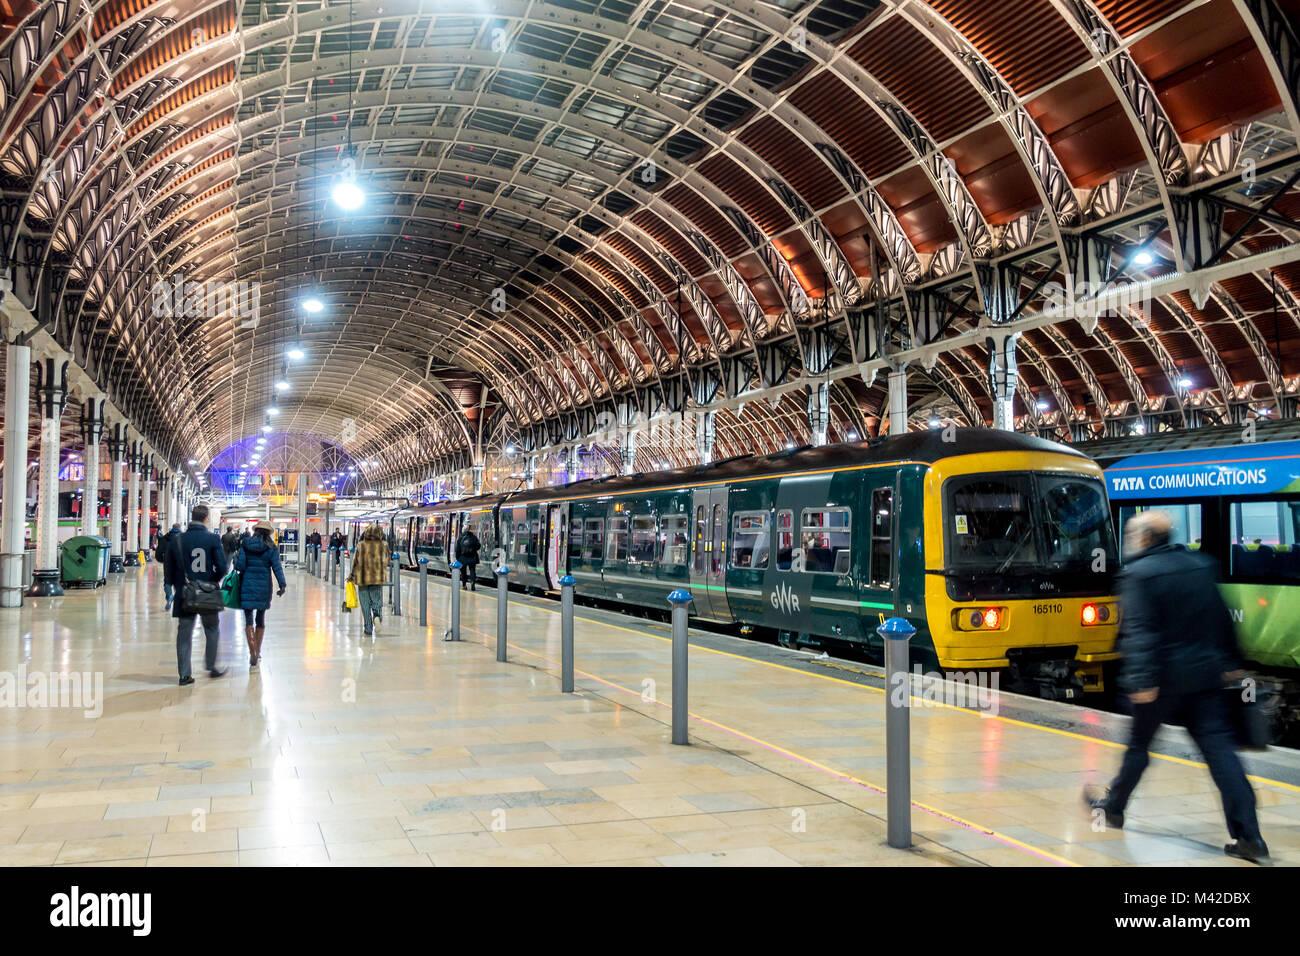 trains-wait-at-the-platform-at-paddington-railway-station-in-london-M42DBX.jpg